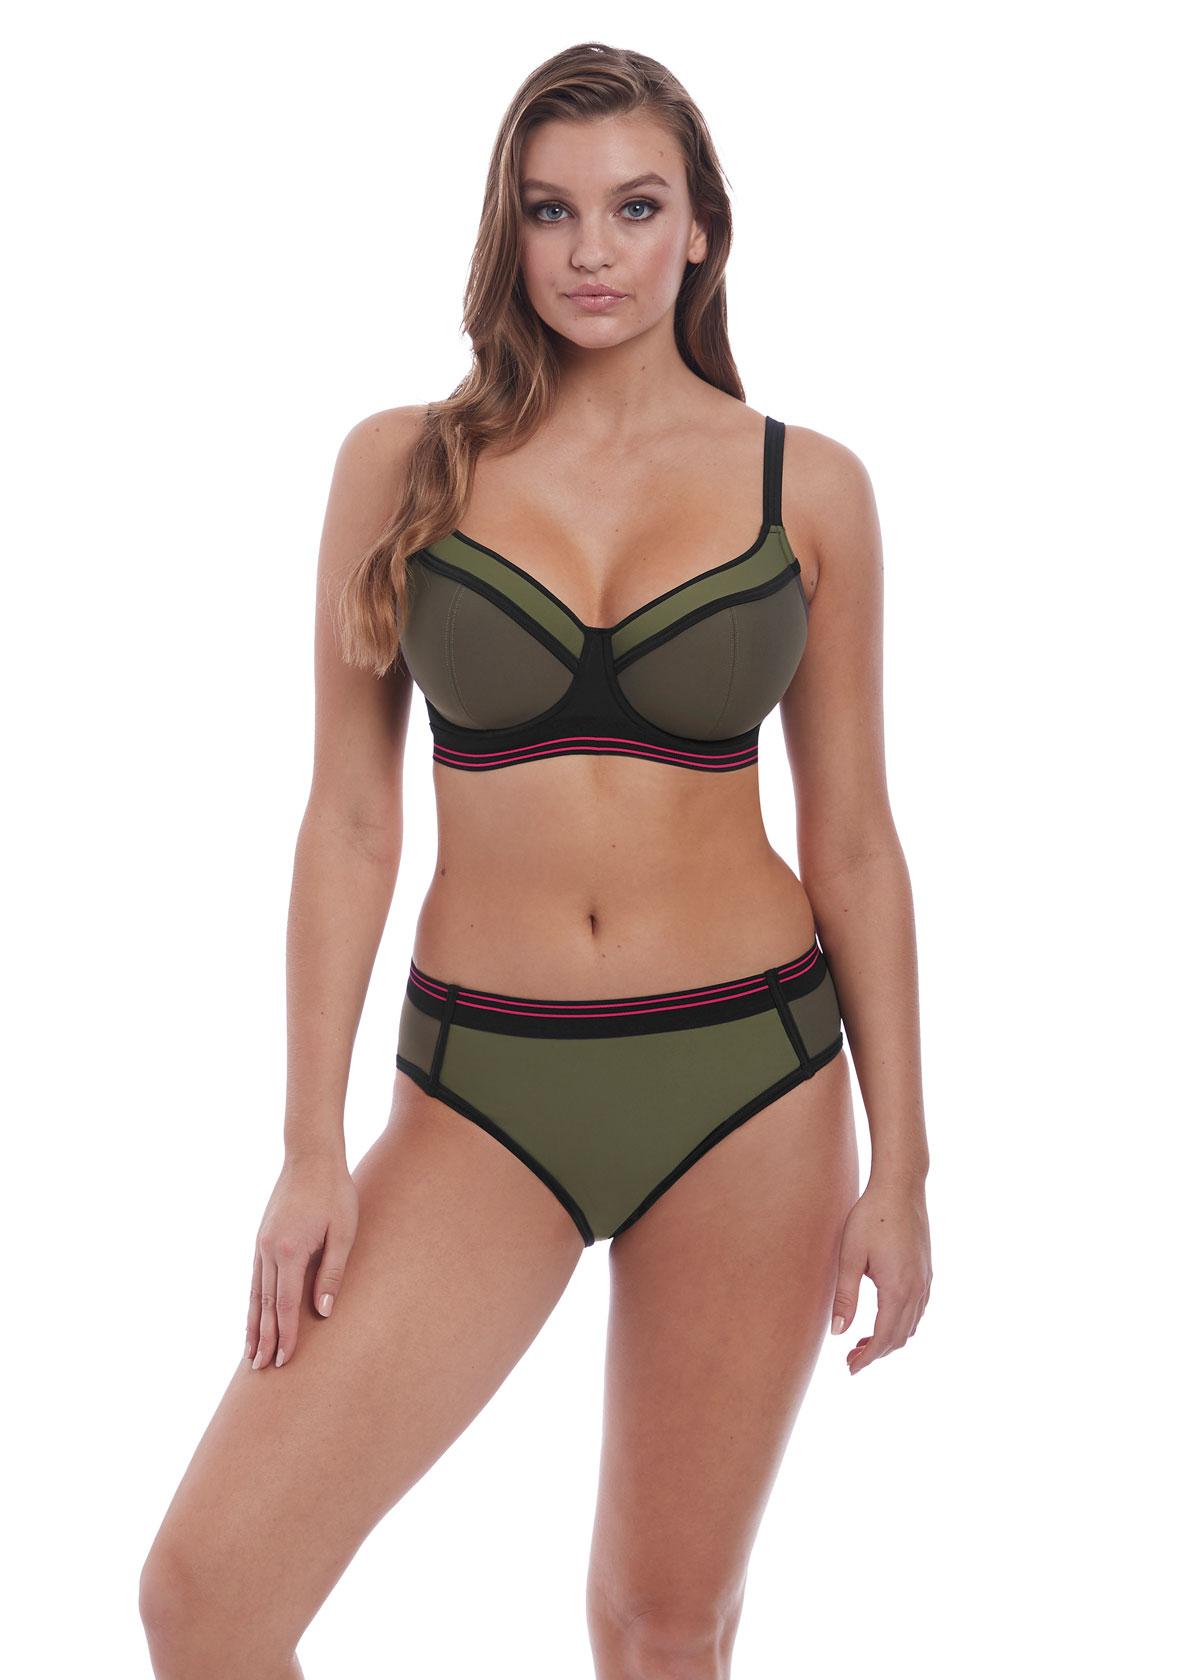 Freya Club Envy Khaki Bikini -£60